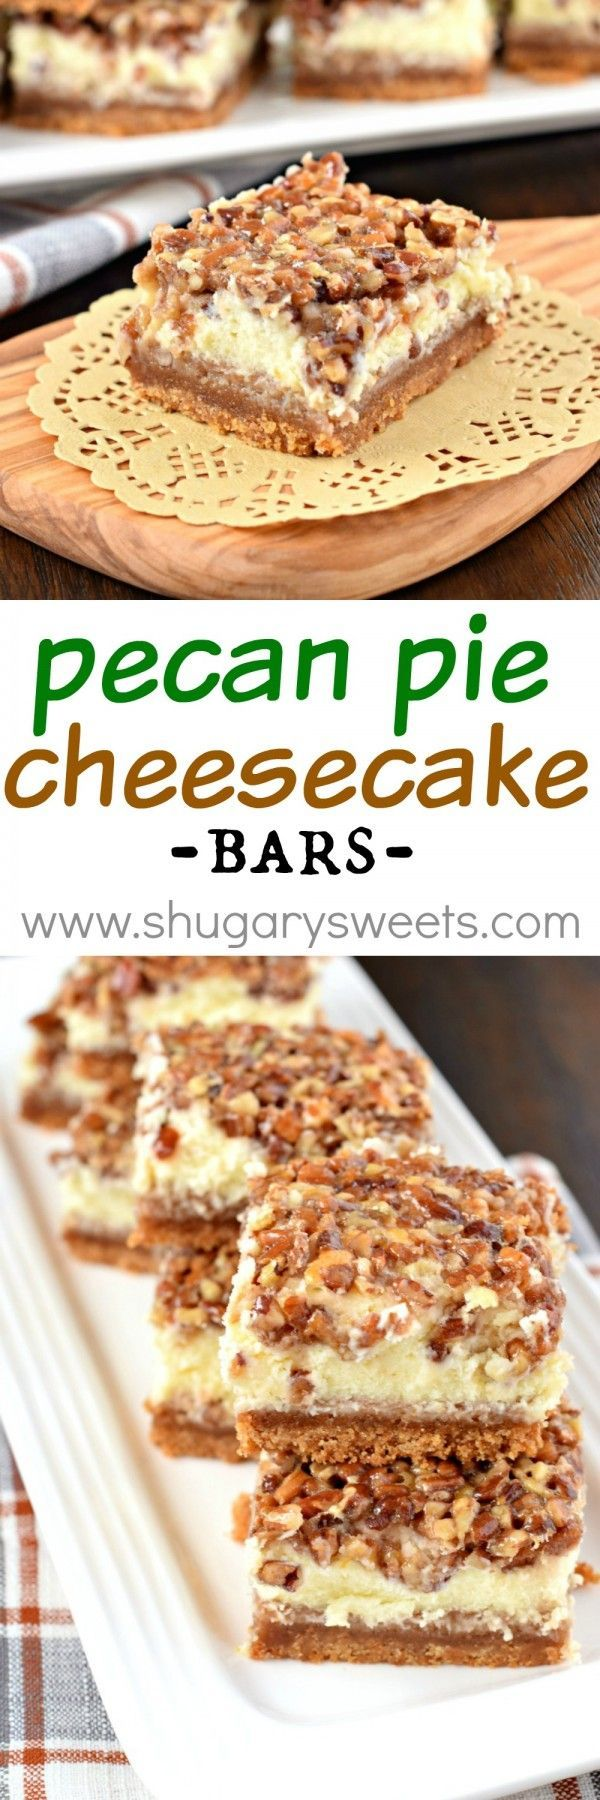 Best 25+ Pecan pie cheesecake ideas on Pinterest | Pecan ...